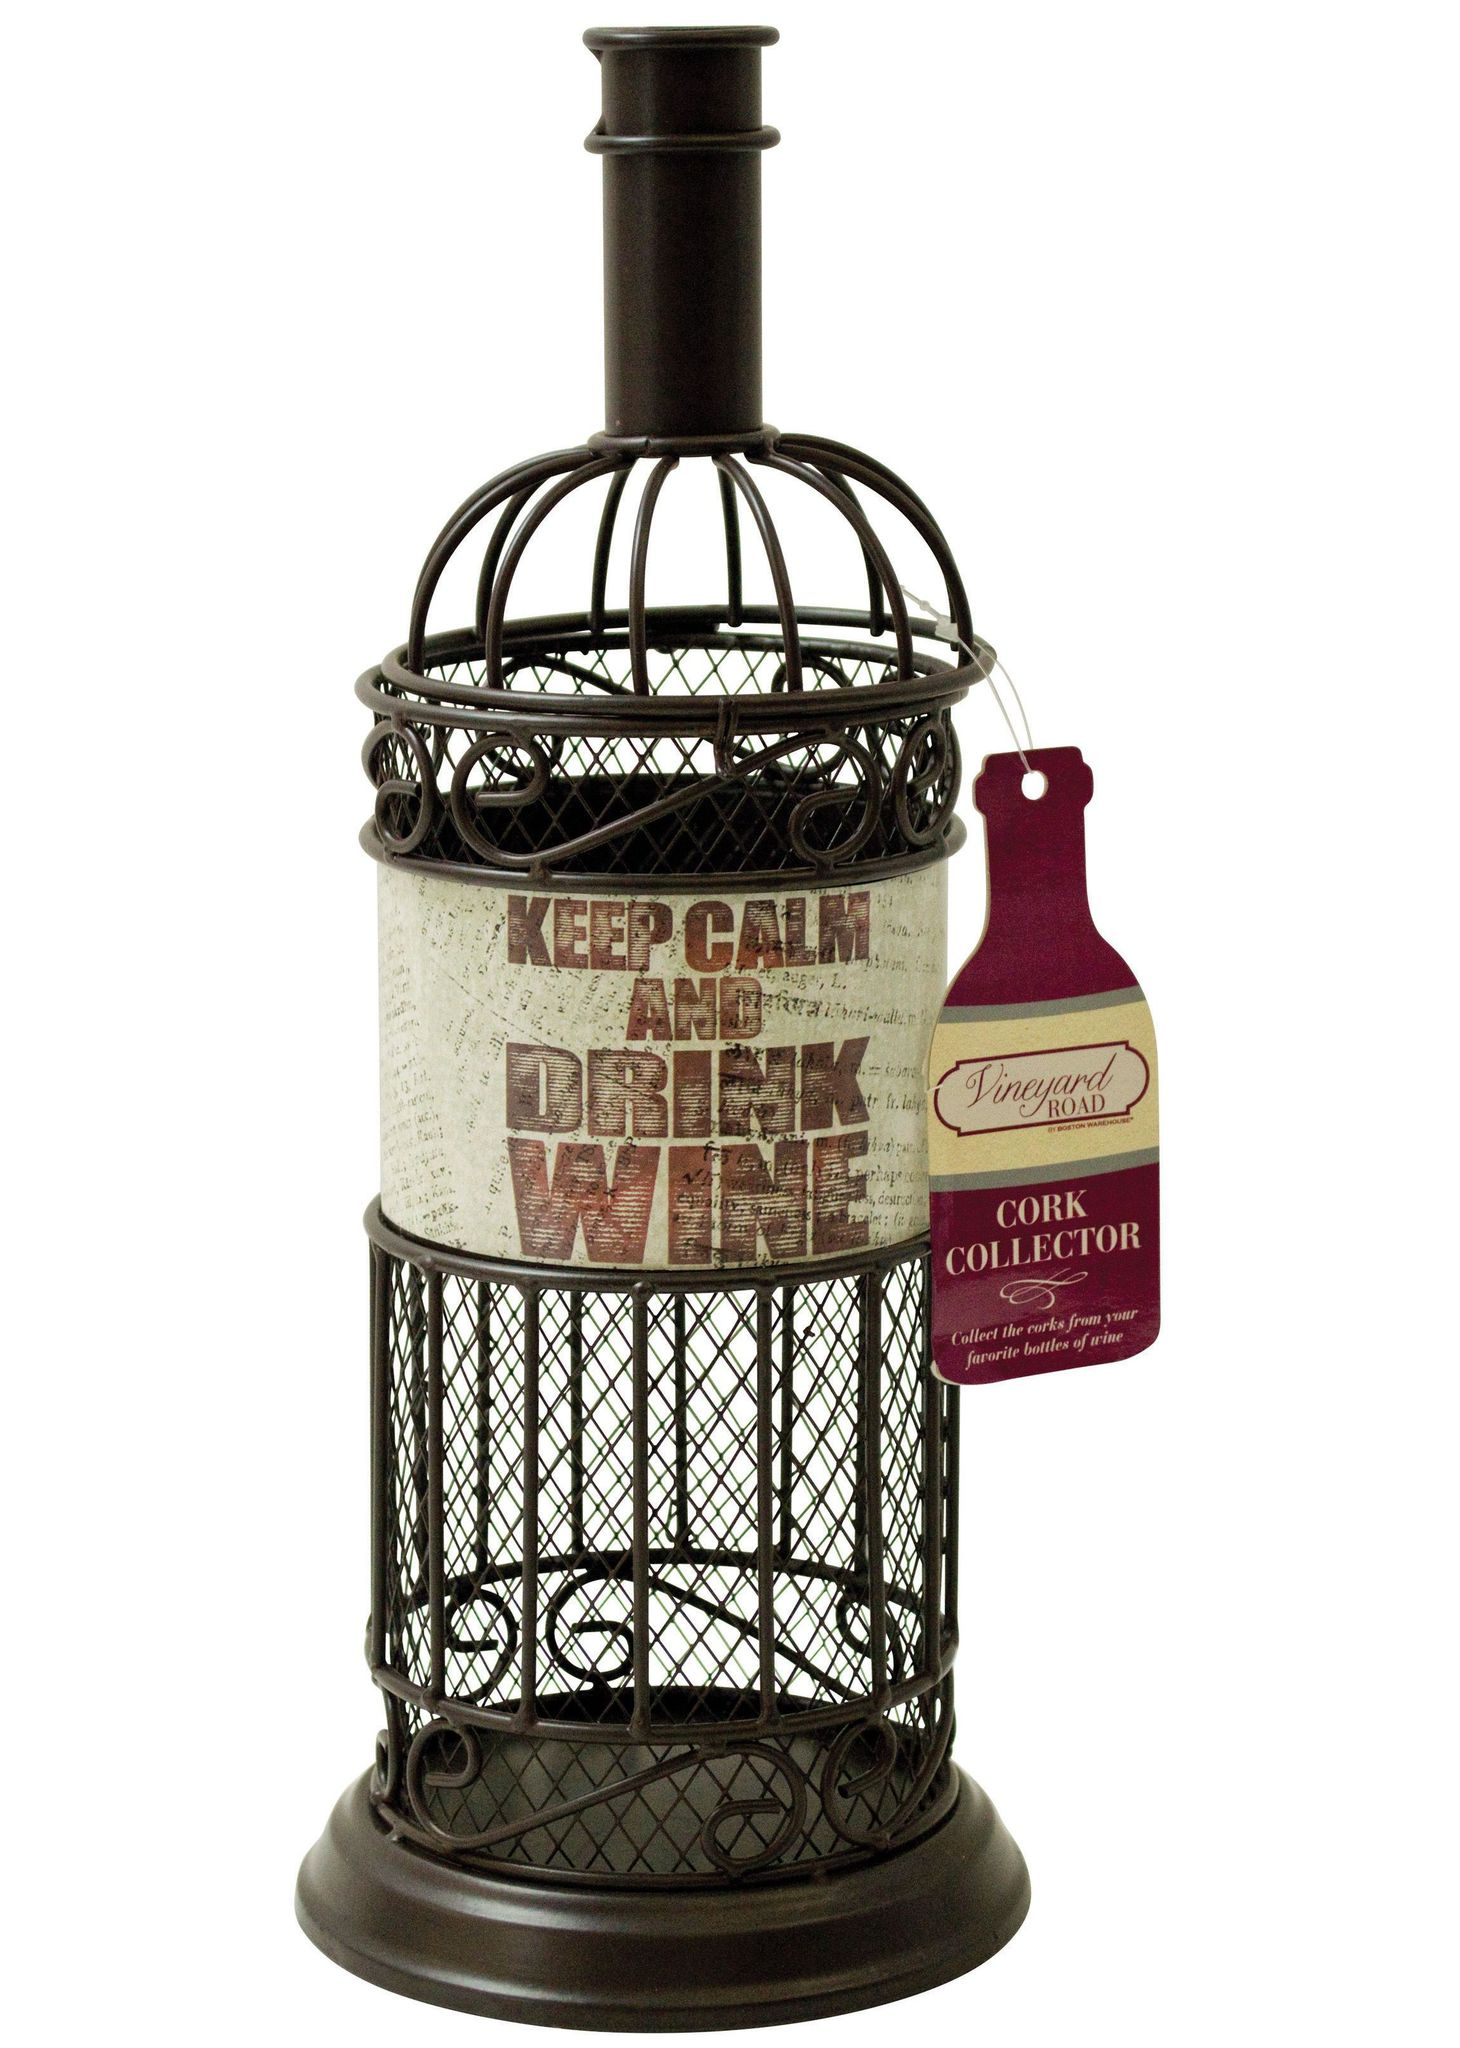 Кухня Декоративная емкость для винных пробок Boston Warehouse Calm Newspaper dekorativnaya-emkost-dlya-vinnyh-probok-boston-warehouse-calm-newspaper-ssha-kitay.jpg